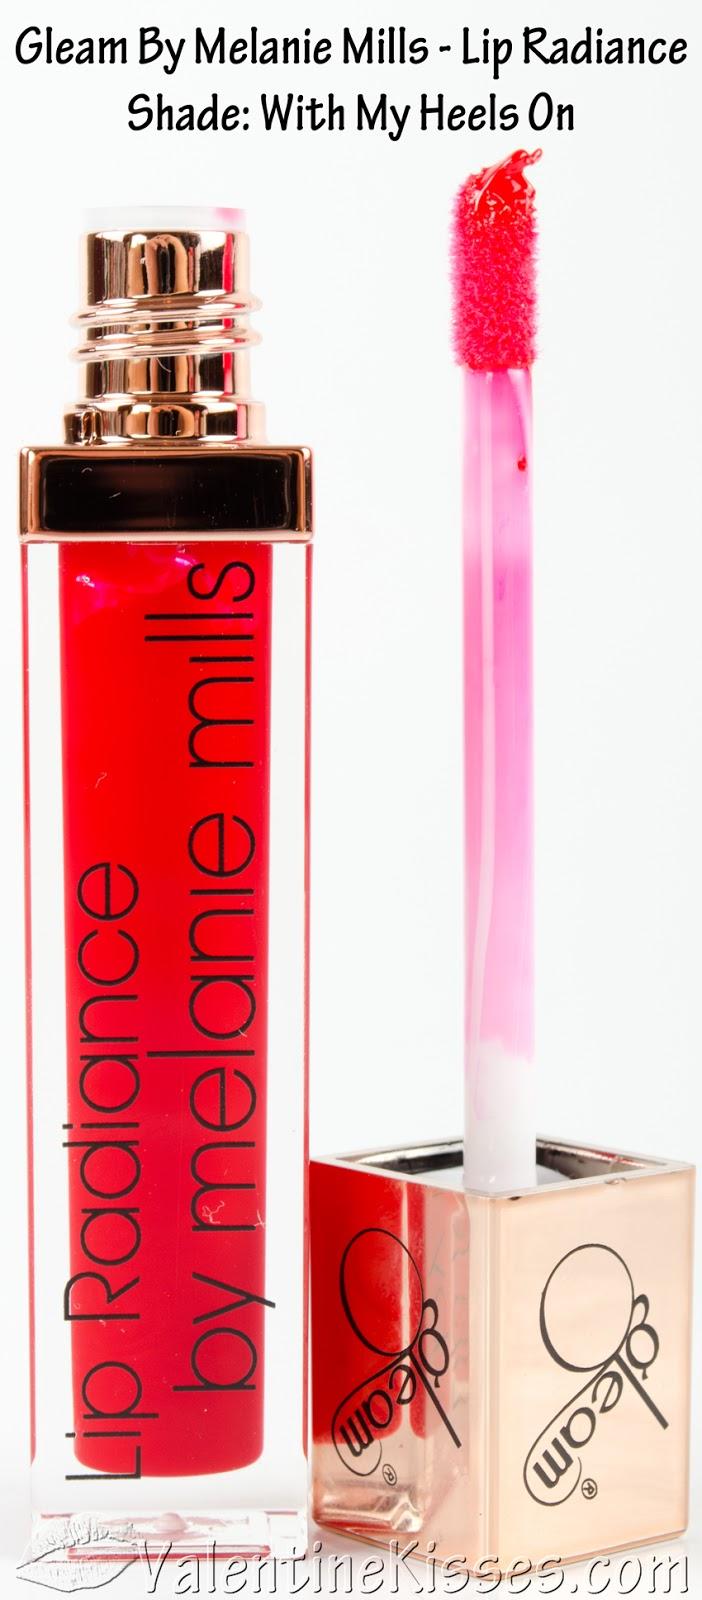 Gleam Reviews Photos: Valentine Kisses: Gleam By Melanie Mills Lip Radiance